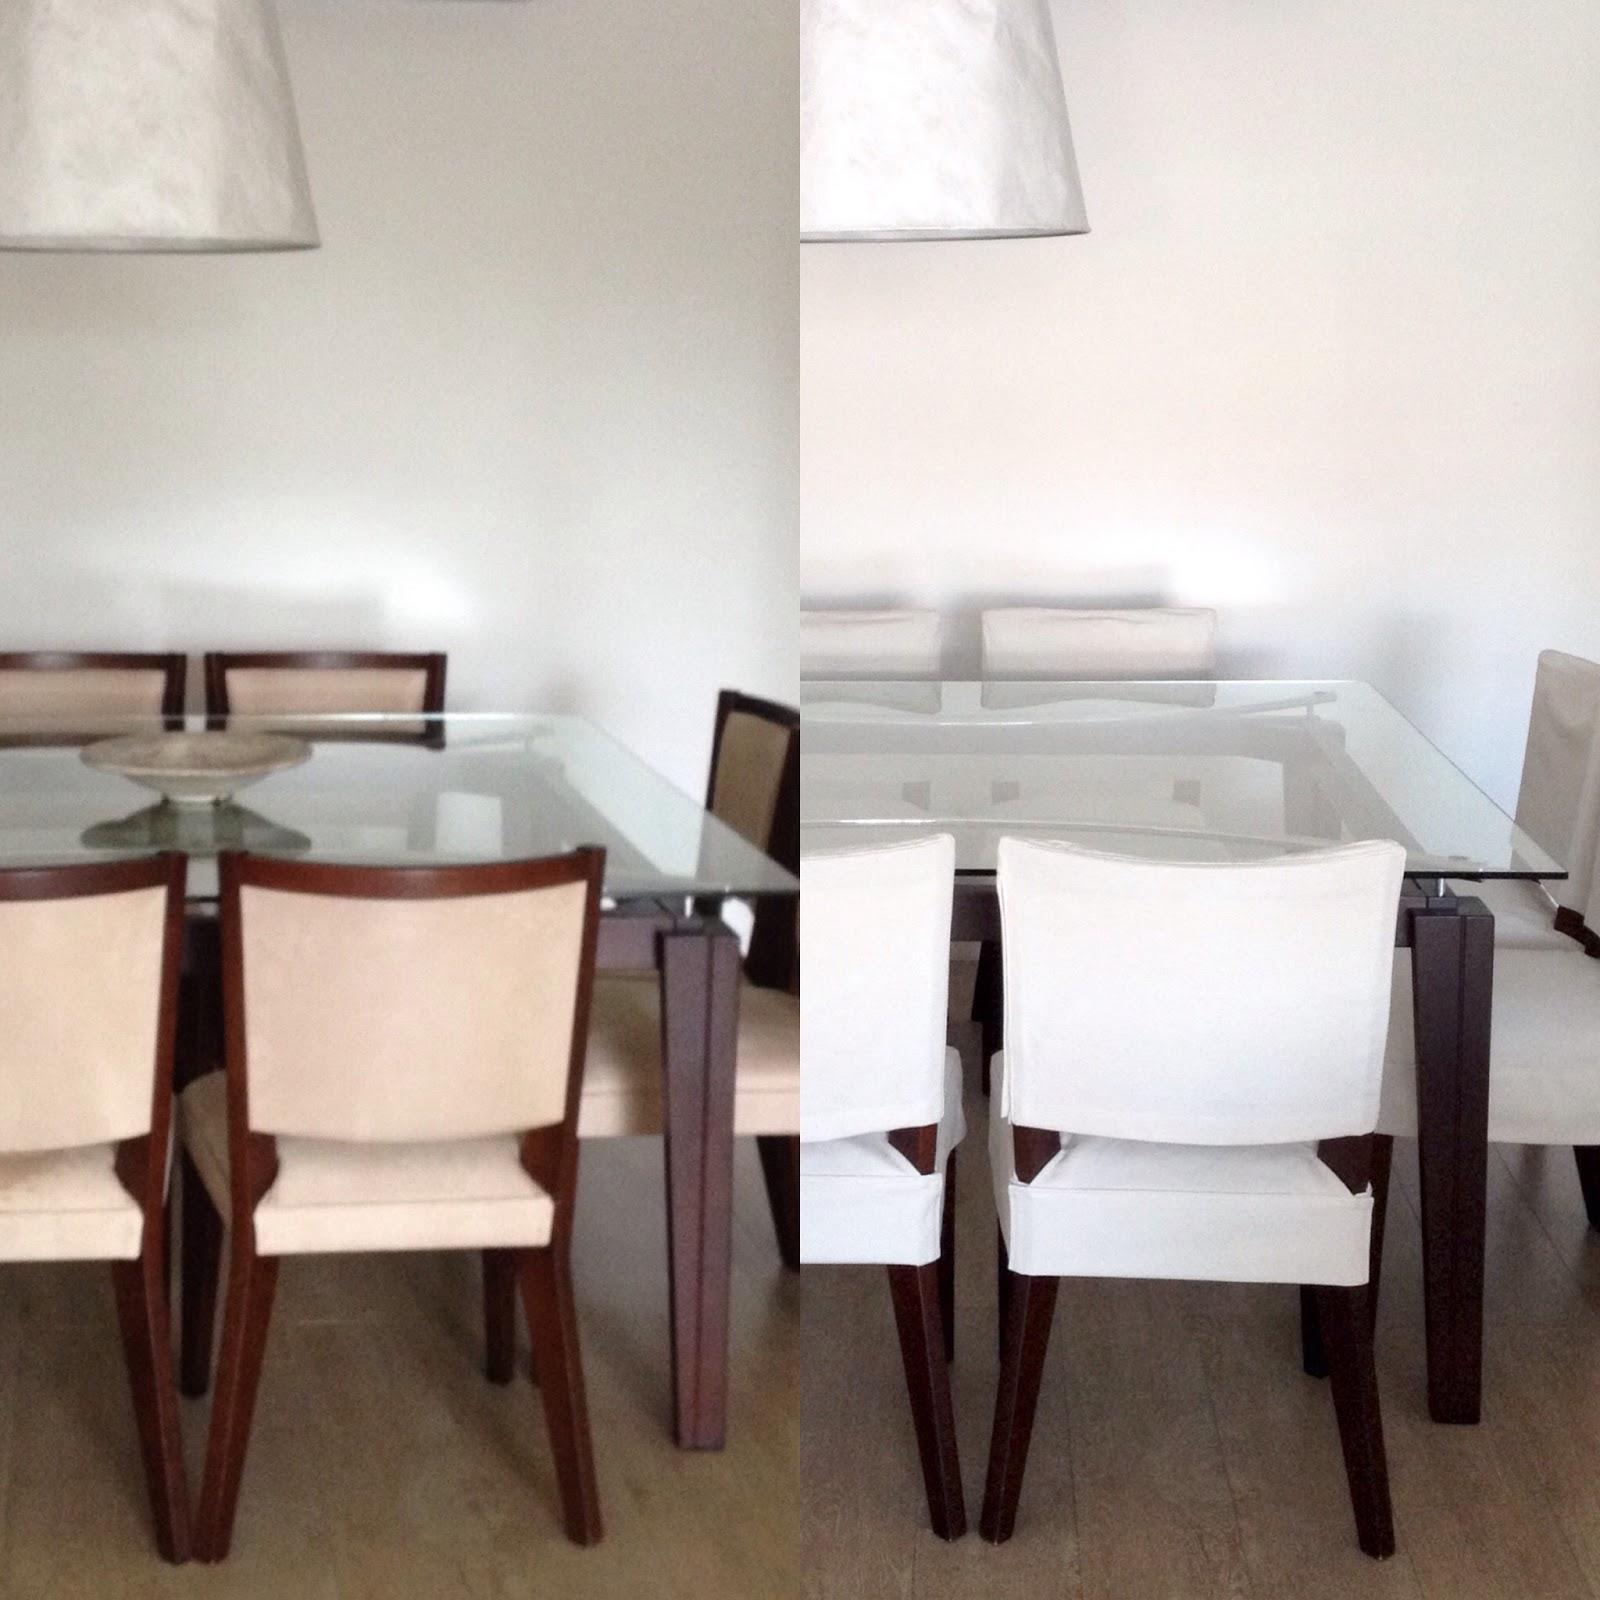 alma deco buenos aires fundas a medida. Black Bedroom Furniture Sets. Home Design Ideas